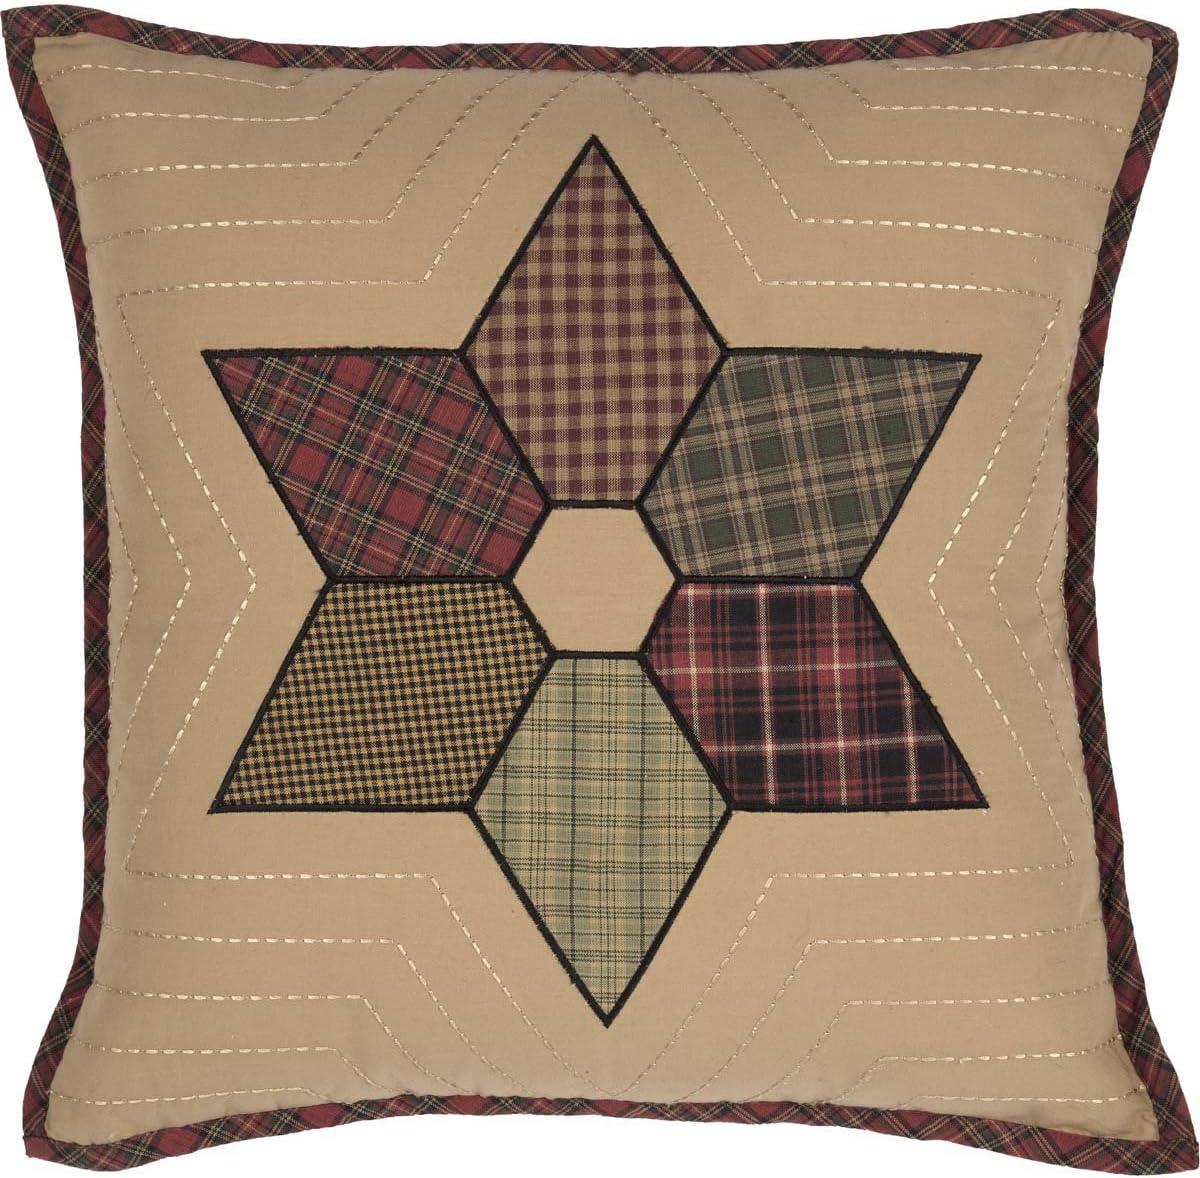 VHC Brands Rustic Lodge Primitive Pillows Throws-Tea Star Patchwork 18 x 18 Pillow, Dark Tan